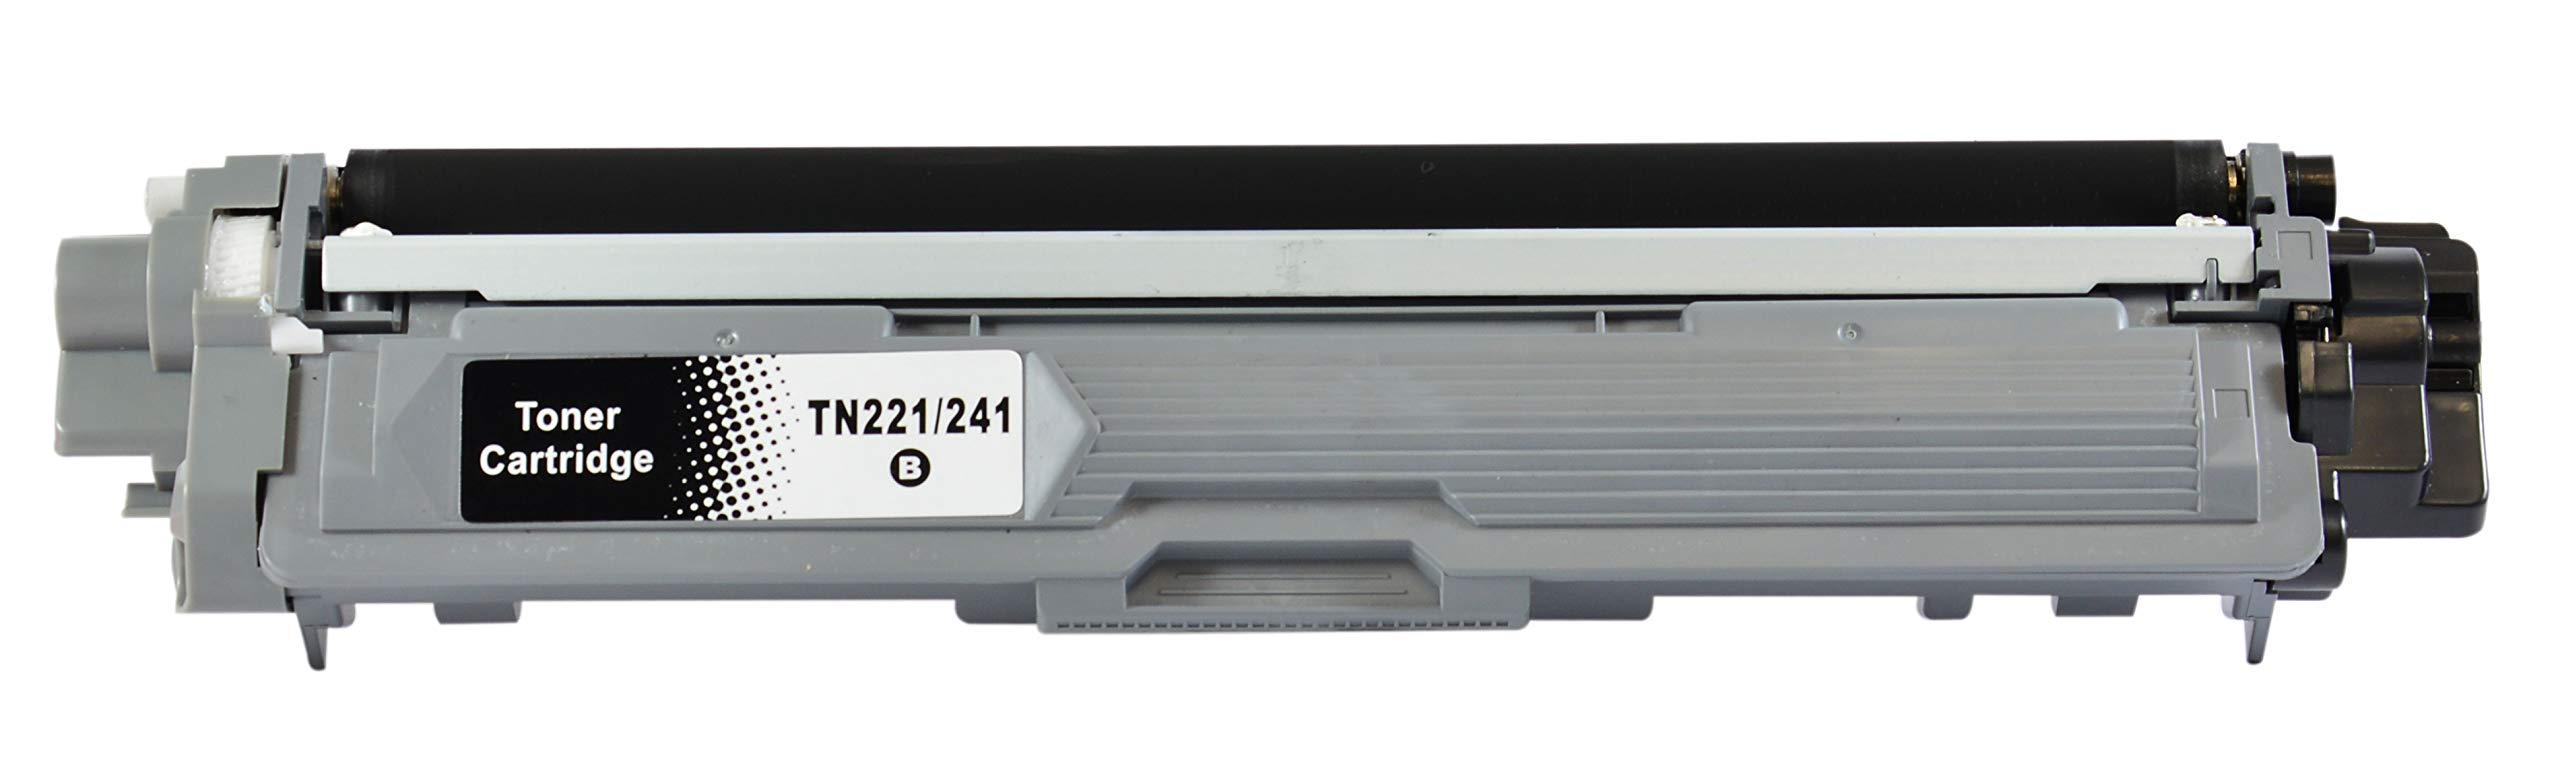 Bubprint-Toner-kompatibel-fr-Brother-TN-241-TN-245-TN241BK-fr-DCP-9020CDW-HL-3140CW-HL-3150CDW-HL-3170CDW-MFC-9130CW-MFC-9140CDN-MFC-9330CDW-Schwarz